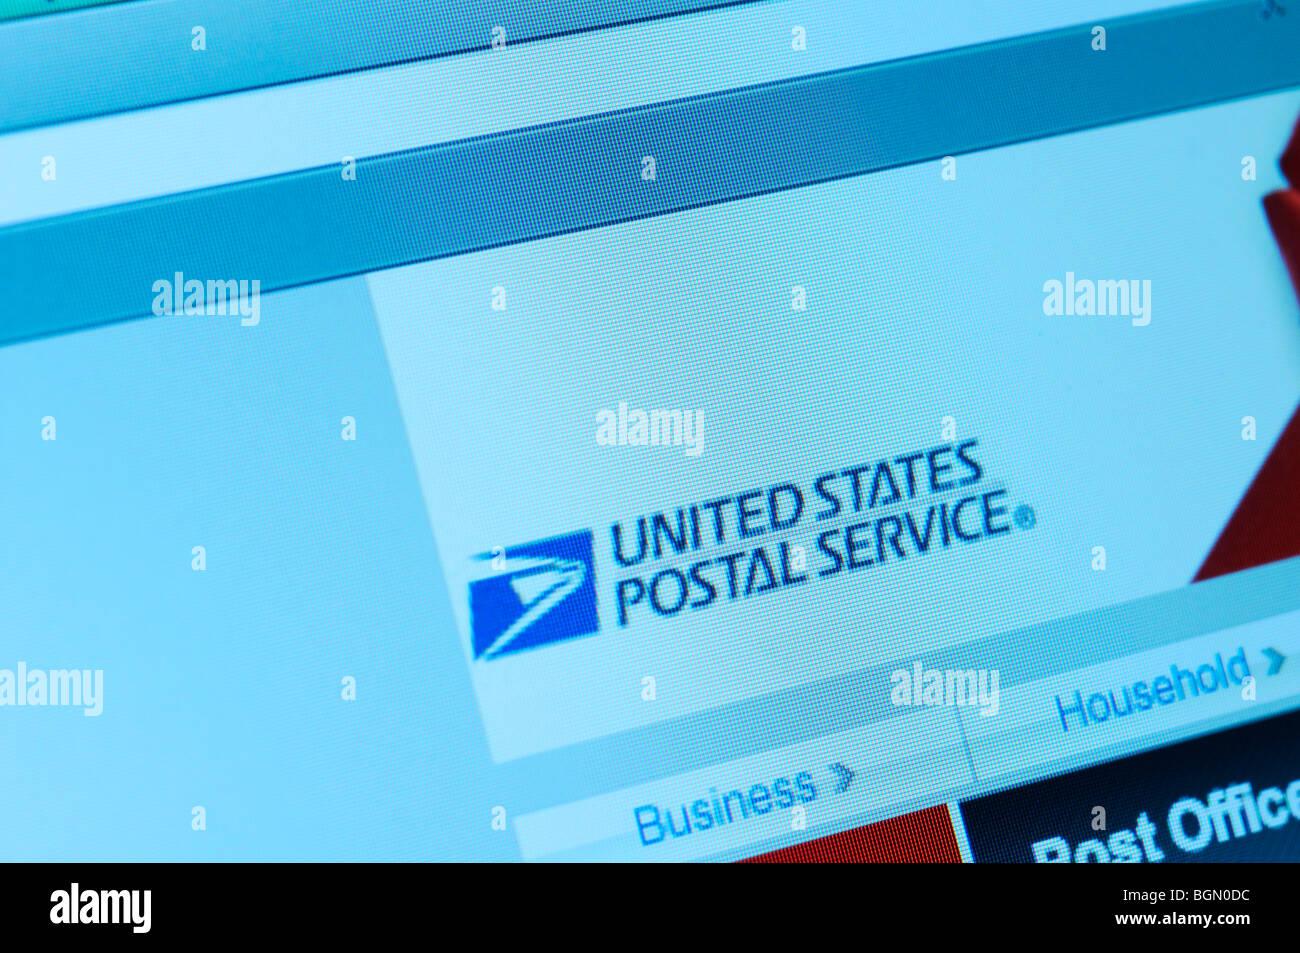 United States Postal Service website - Stock Image